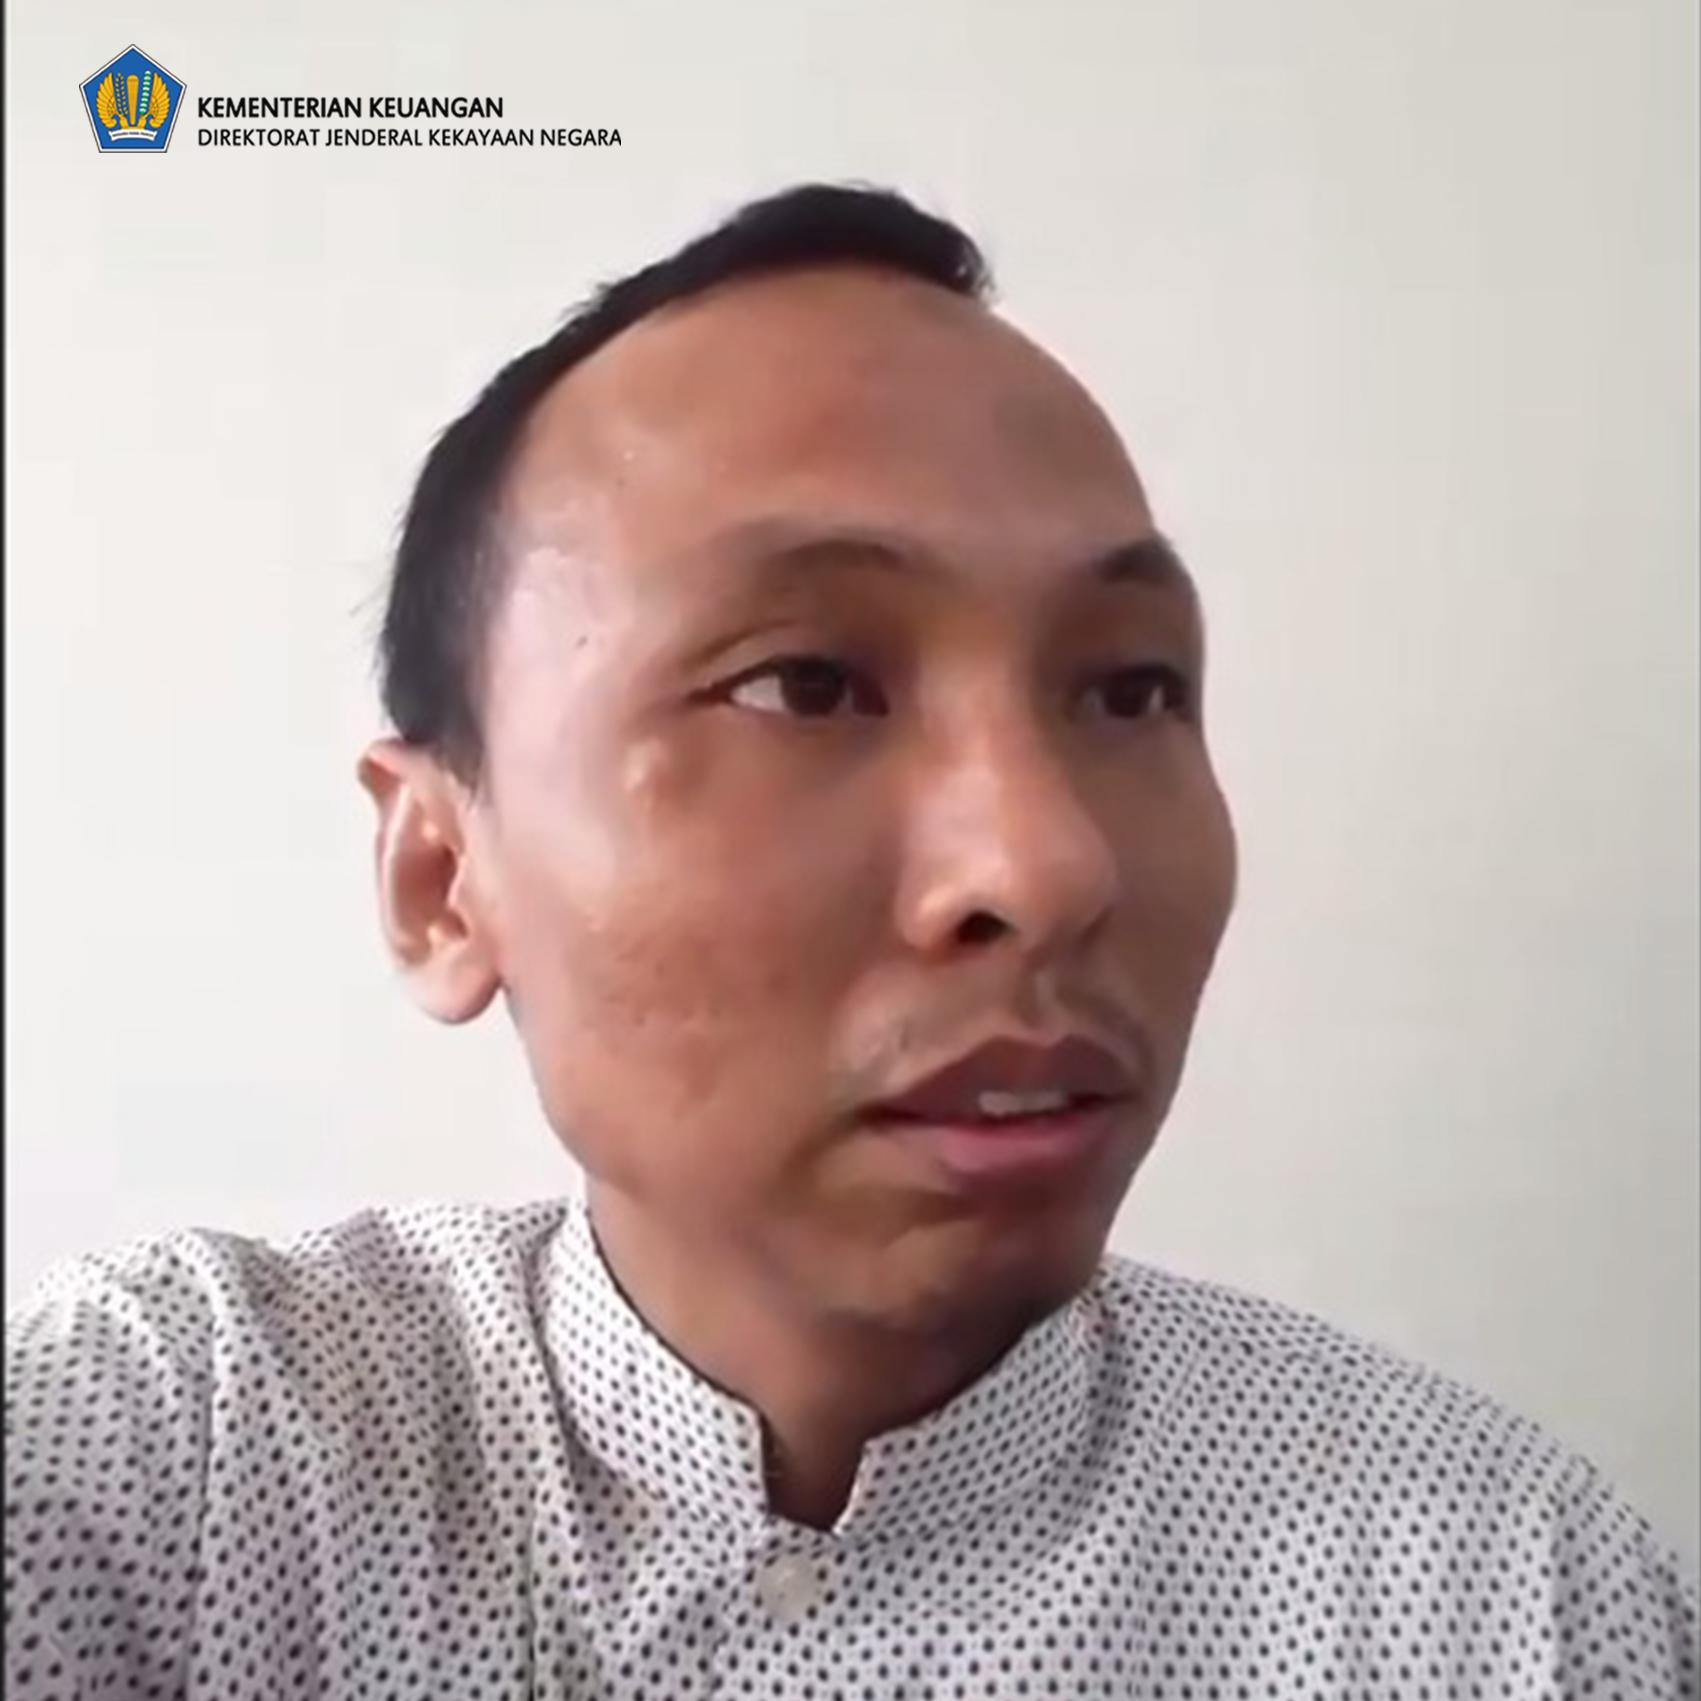 DKO Triwulan II Tahun 2020, Kepala KPKNL Jakarta V: Tetap Fokus dan Patuhi Protokol Kesehatan